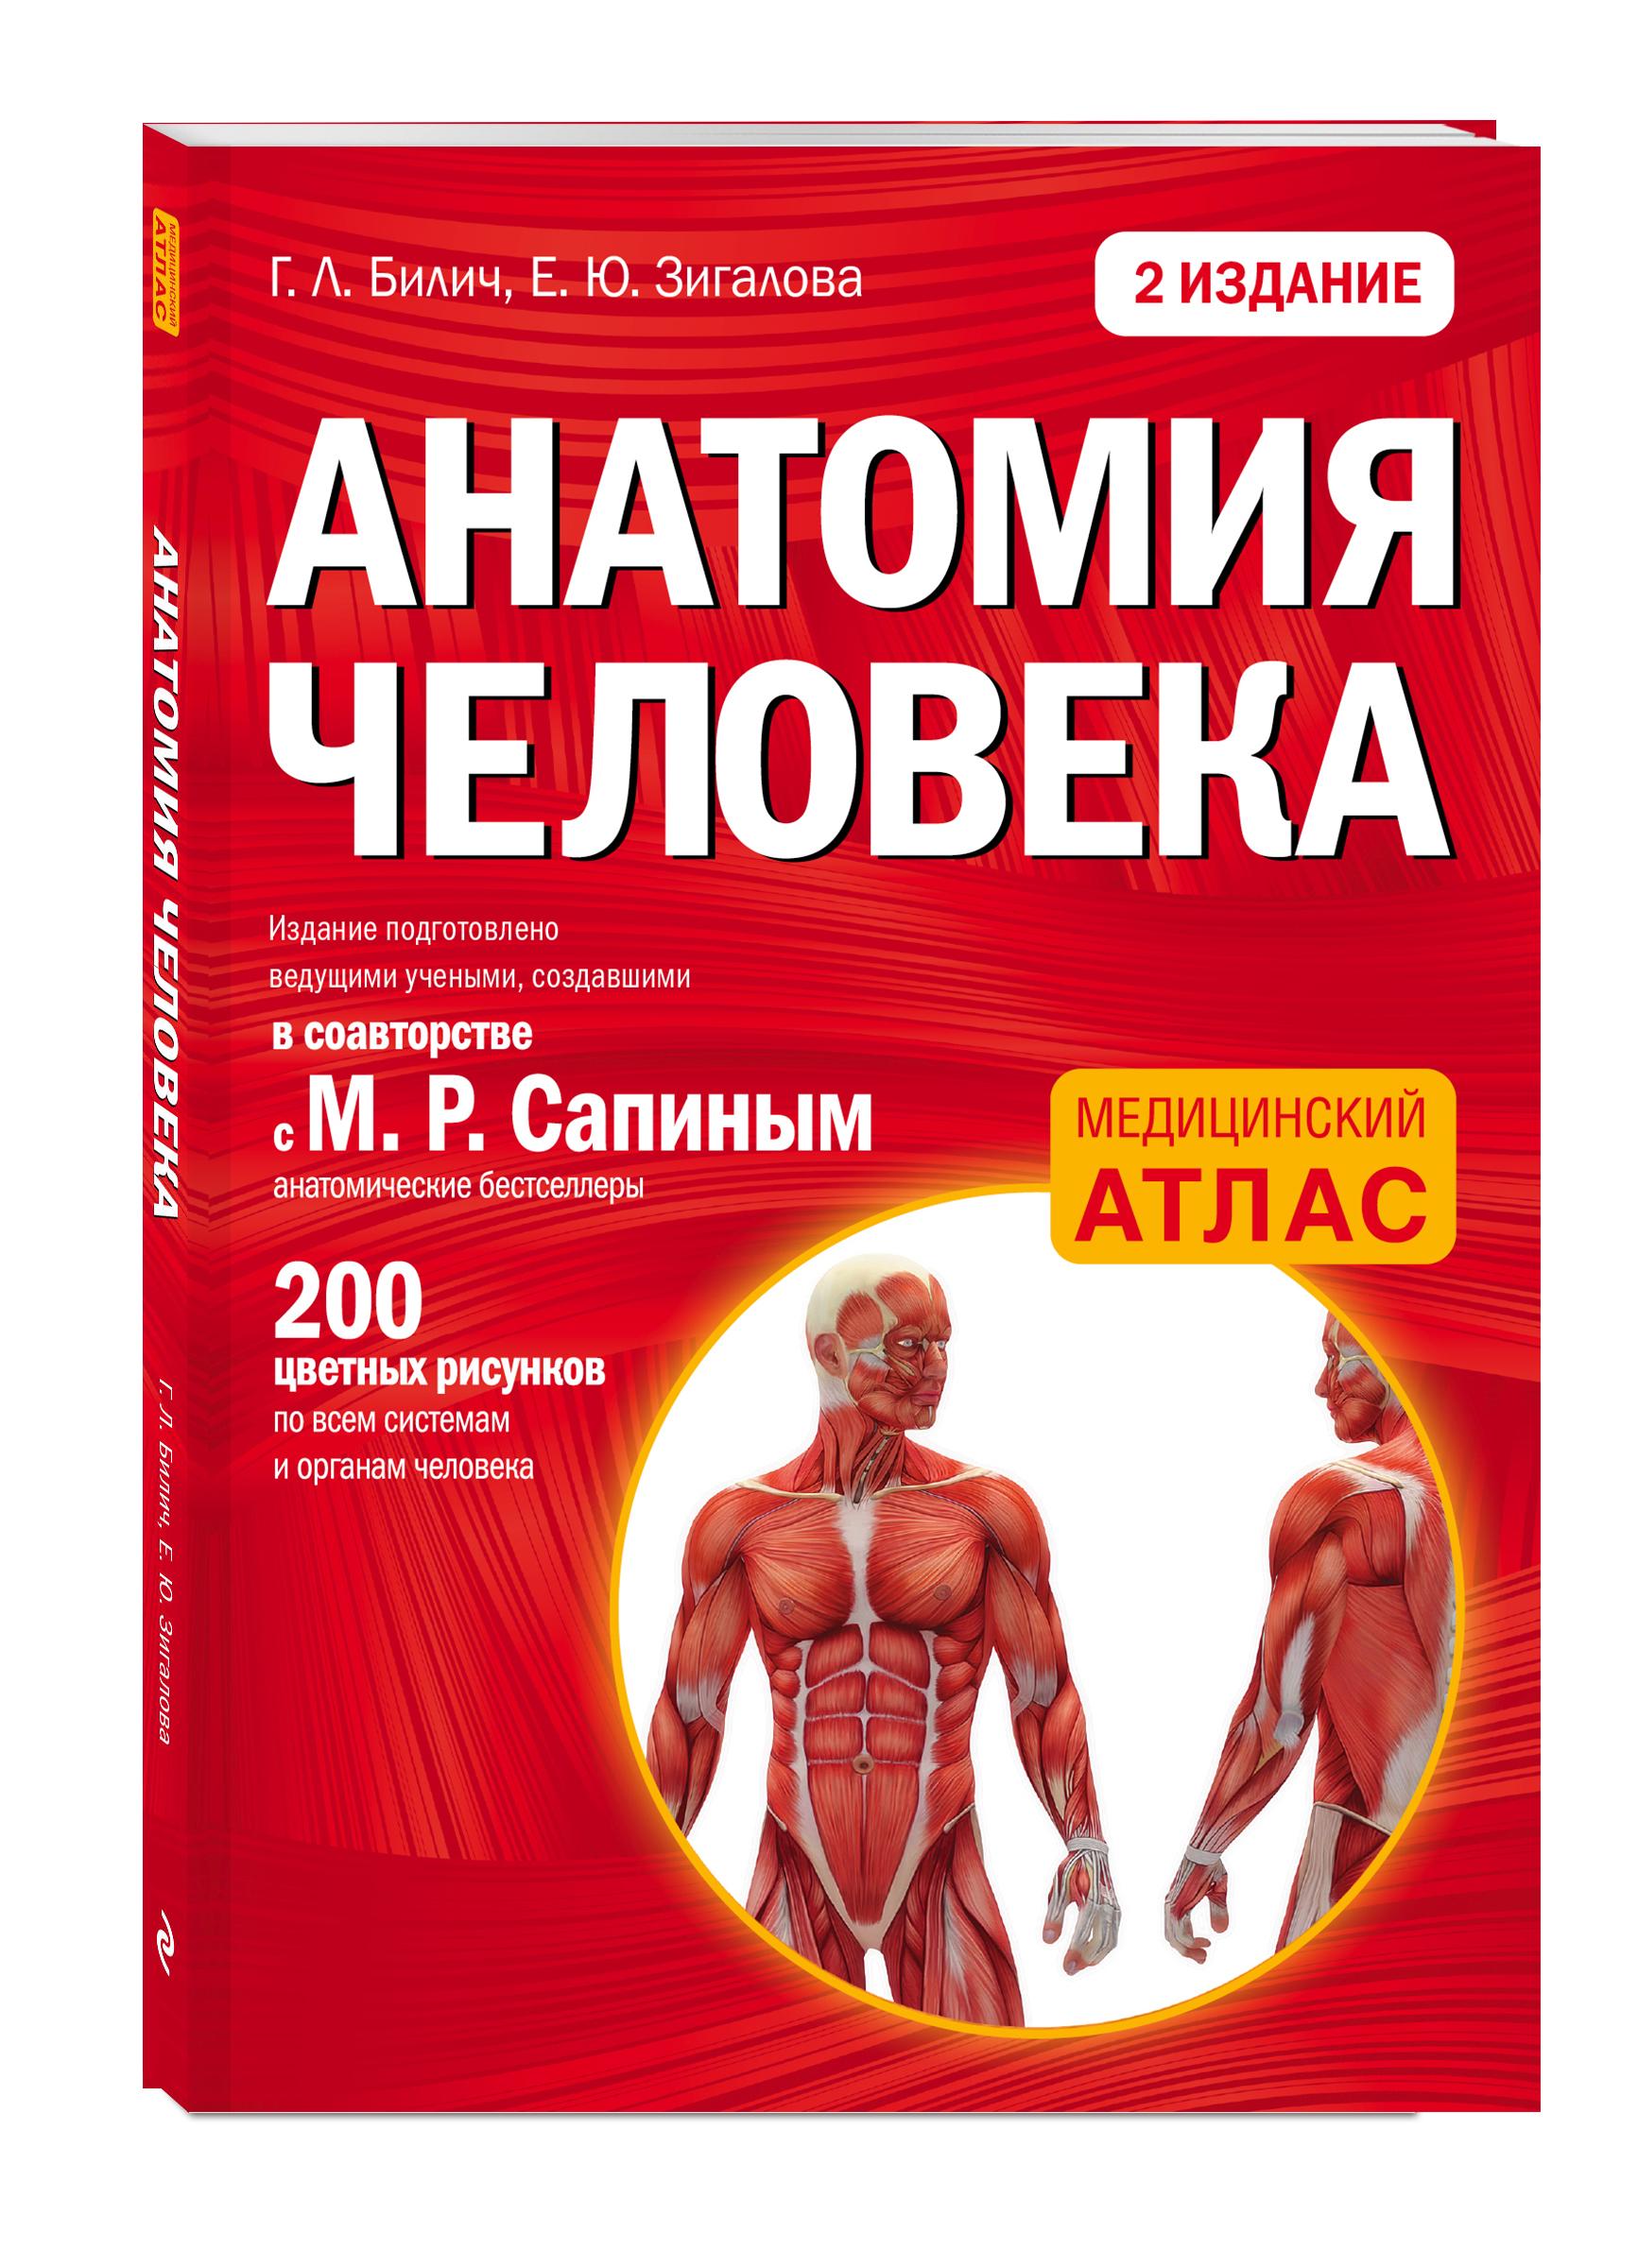 Билич Г.Л., Зигалова Е.Ю. Анатомия человека: 2 издание билич г зигалова е анатомия человека русско латинский атлас 2 е издание